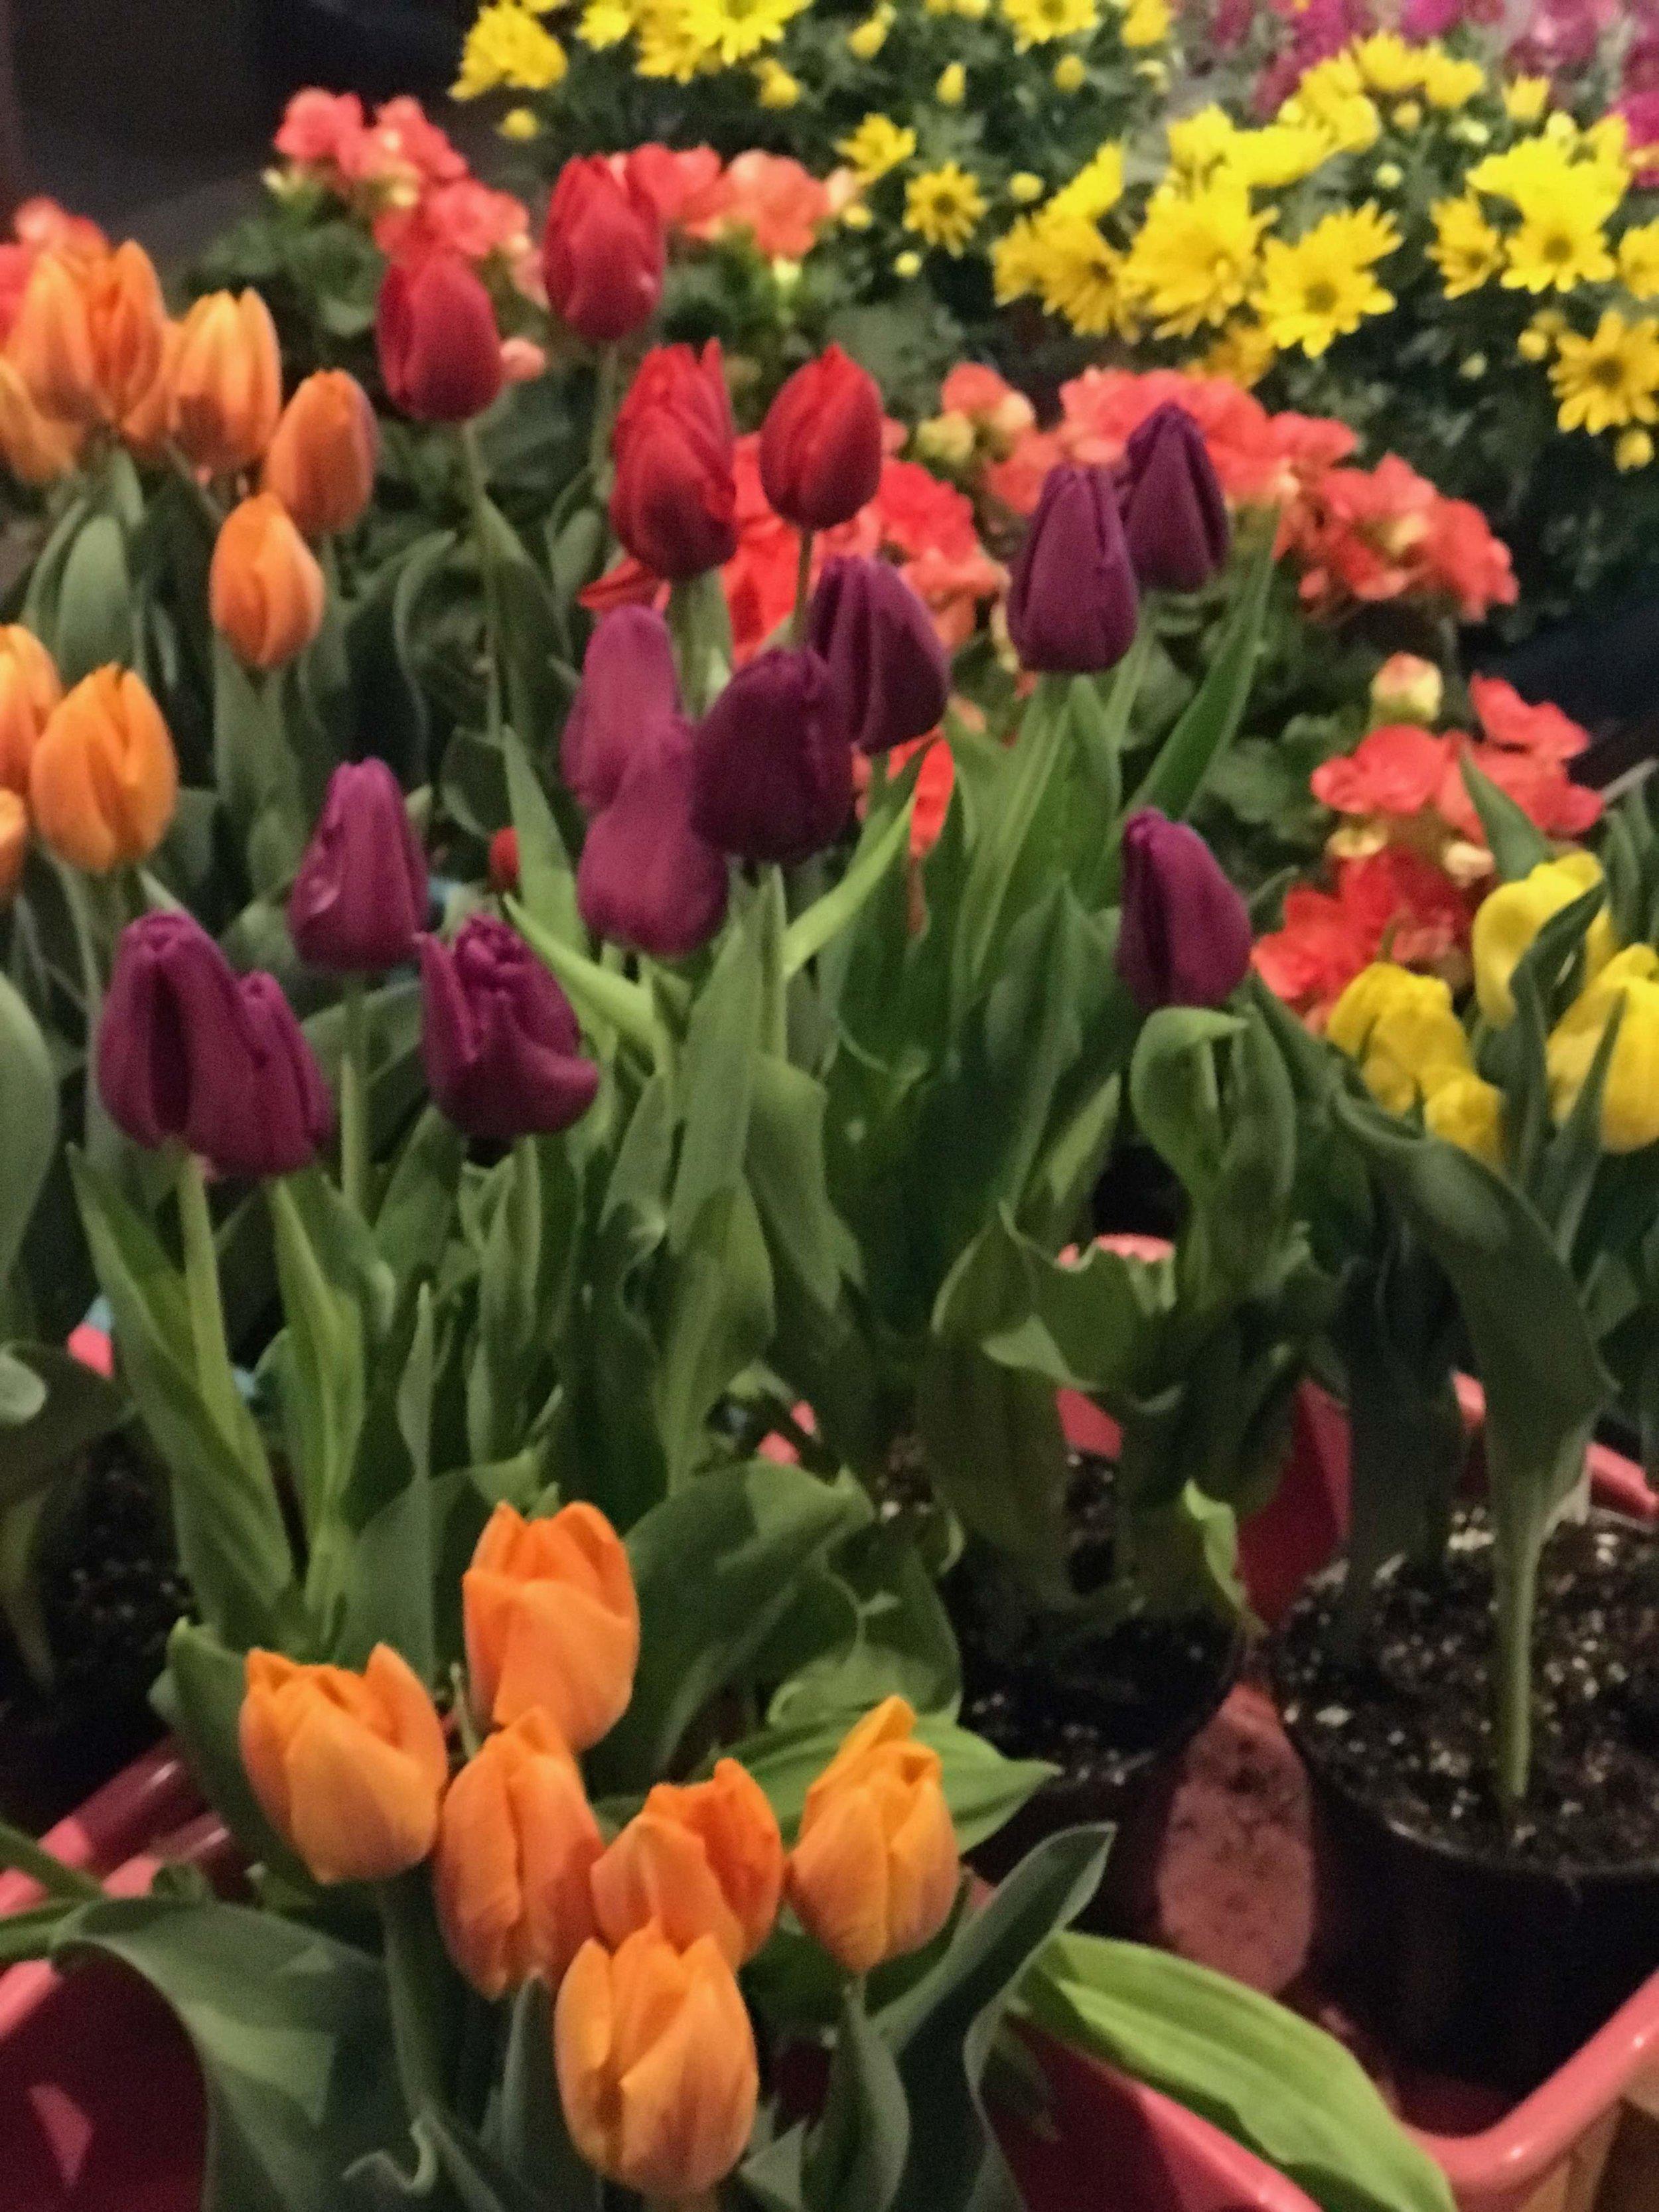 Spring Tulips for Easter celebrations